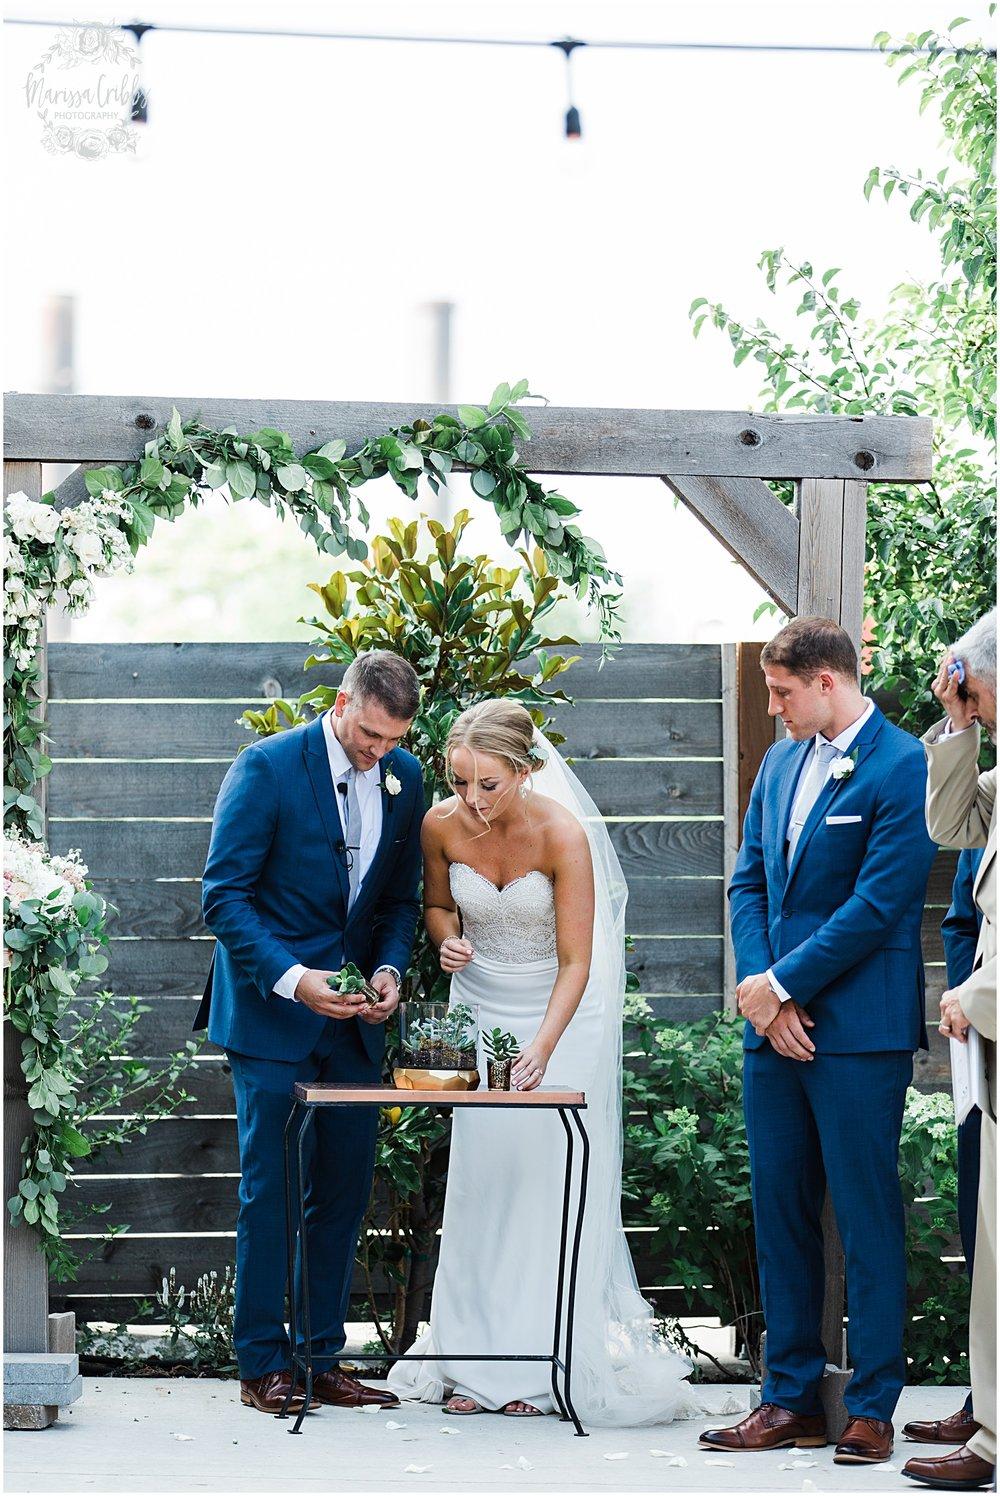 MAGNOLIA VENUE WEDDING | CHARLIE & NATALIE | MARISSA CRIBBS PHOTOGRAPHY_5763.jpg